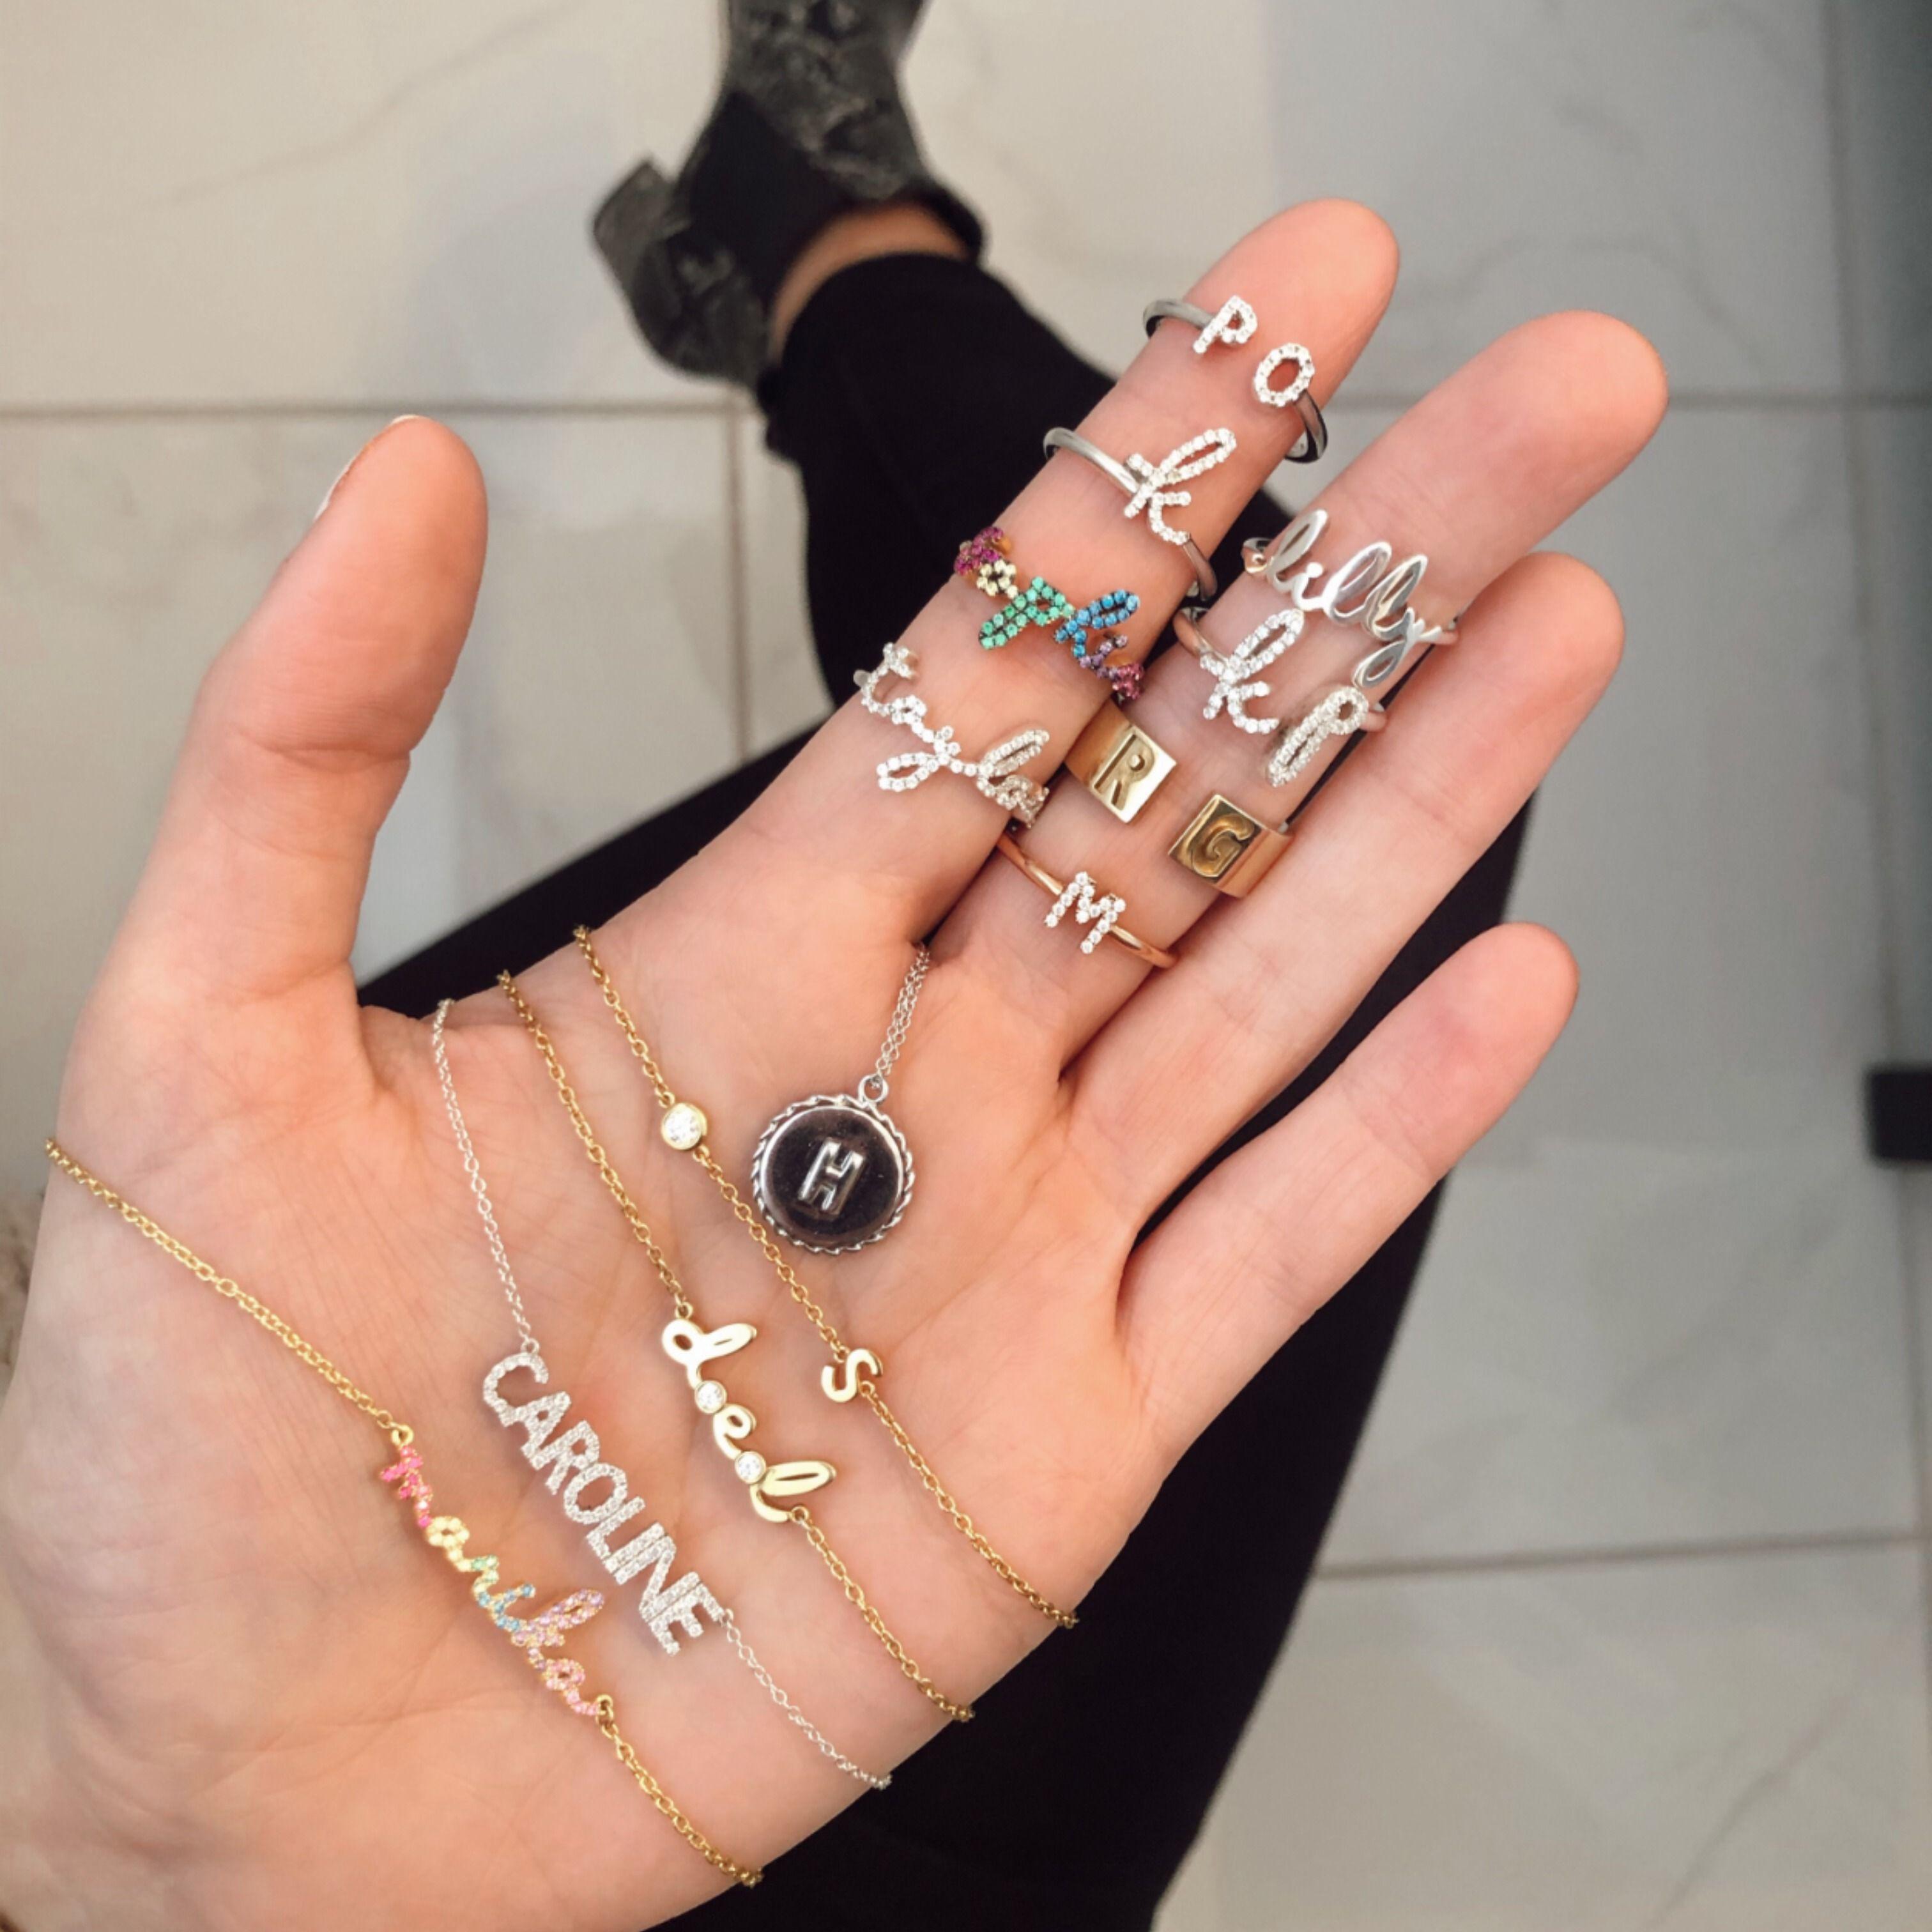 38+ How to start a custom jewelry line ideas in 2021